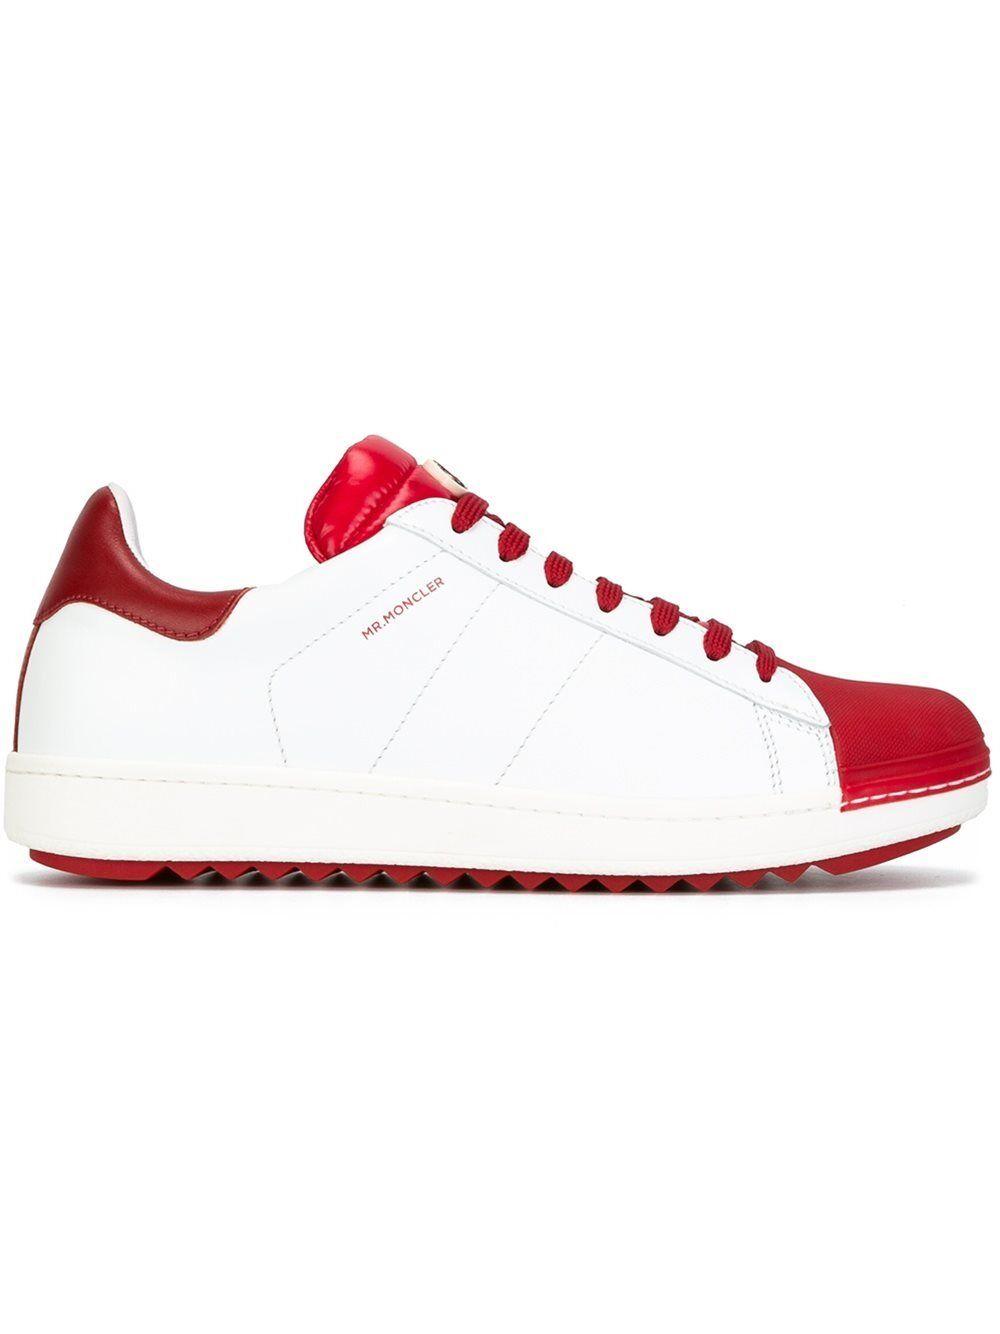 77038efd95bf ... MONCLER SNEAKERS Joachim Joachim Joachim  470 Men shoes 100%AUT nbw16us  cdb7c1 ...